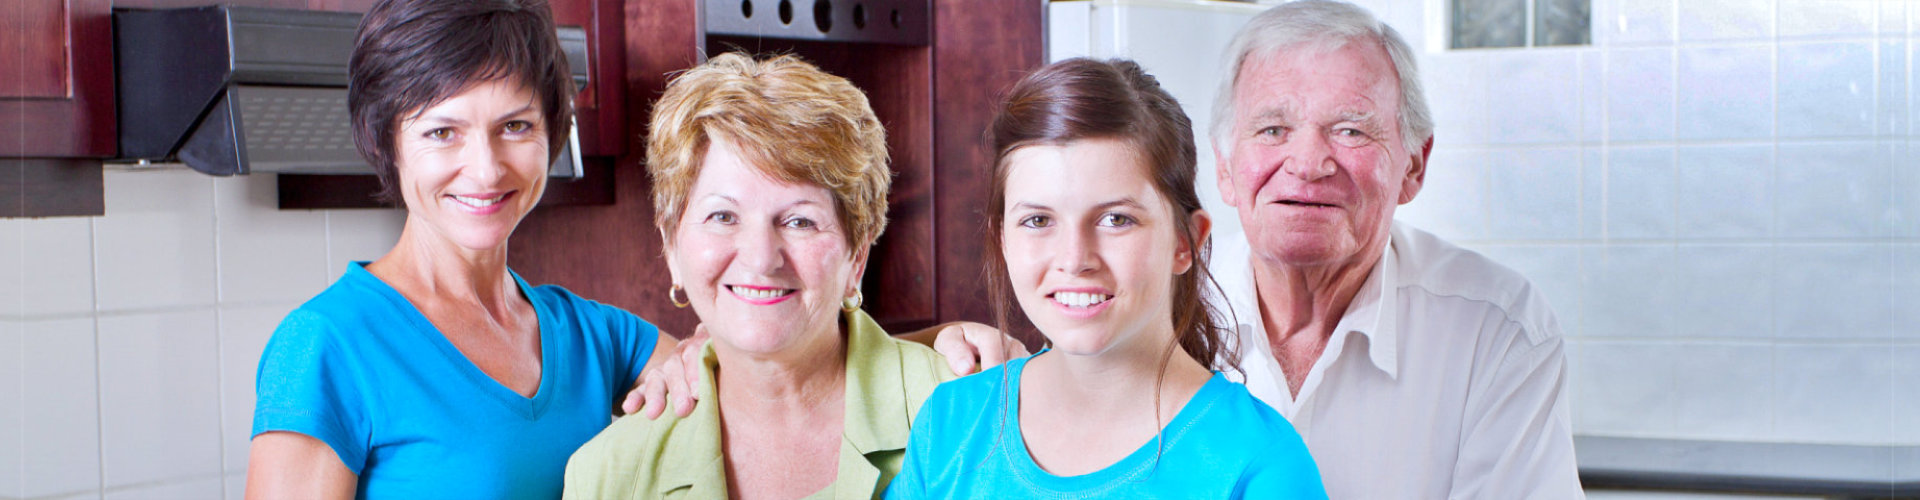 family portrait in kitchen